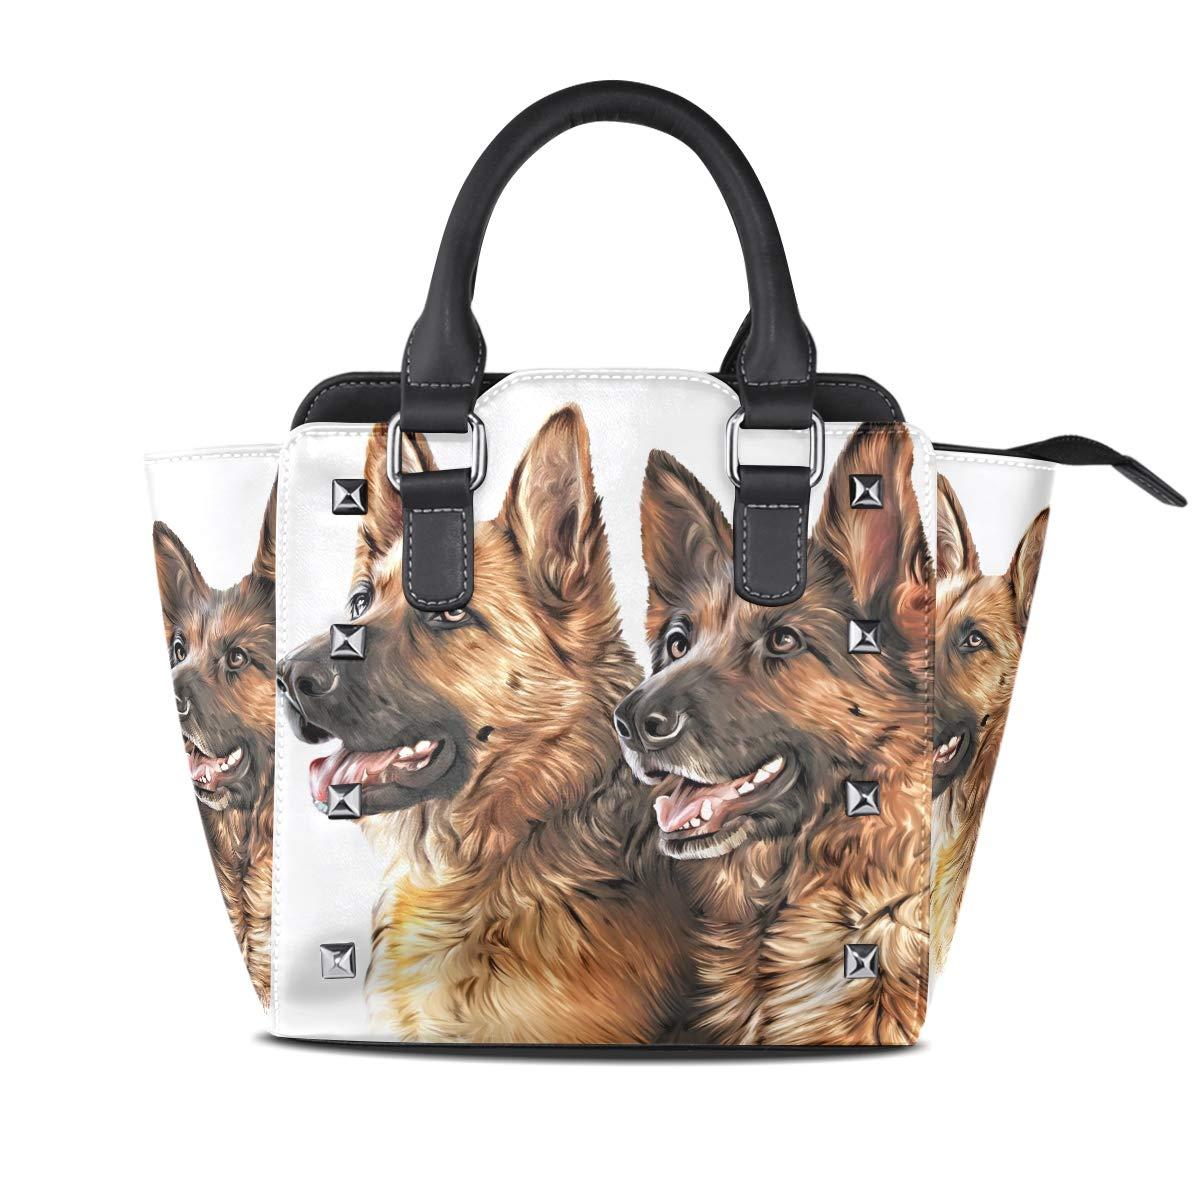 Design4 Handbag Coloful Halo Flower Carp Genuine Leather Tote Rivet Bag Shoulder Strap Top Handle Women